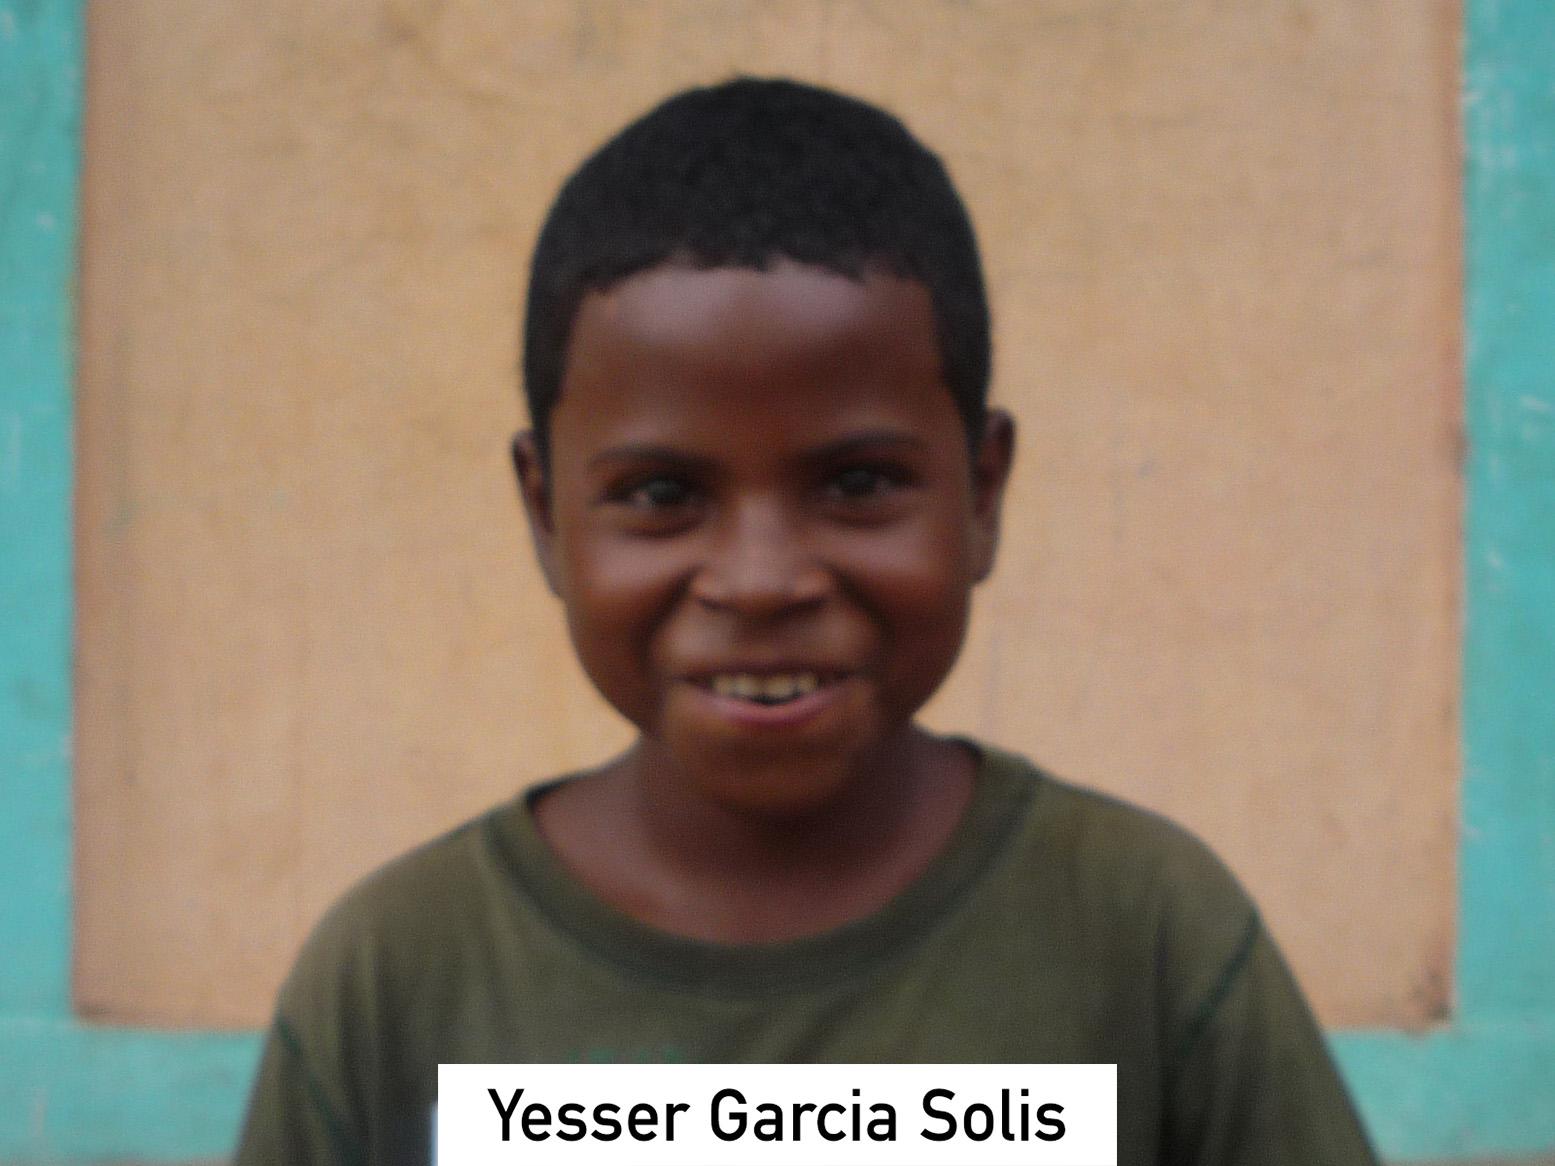 003 - Yesser Garcia Solis.jpg